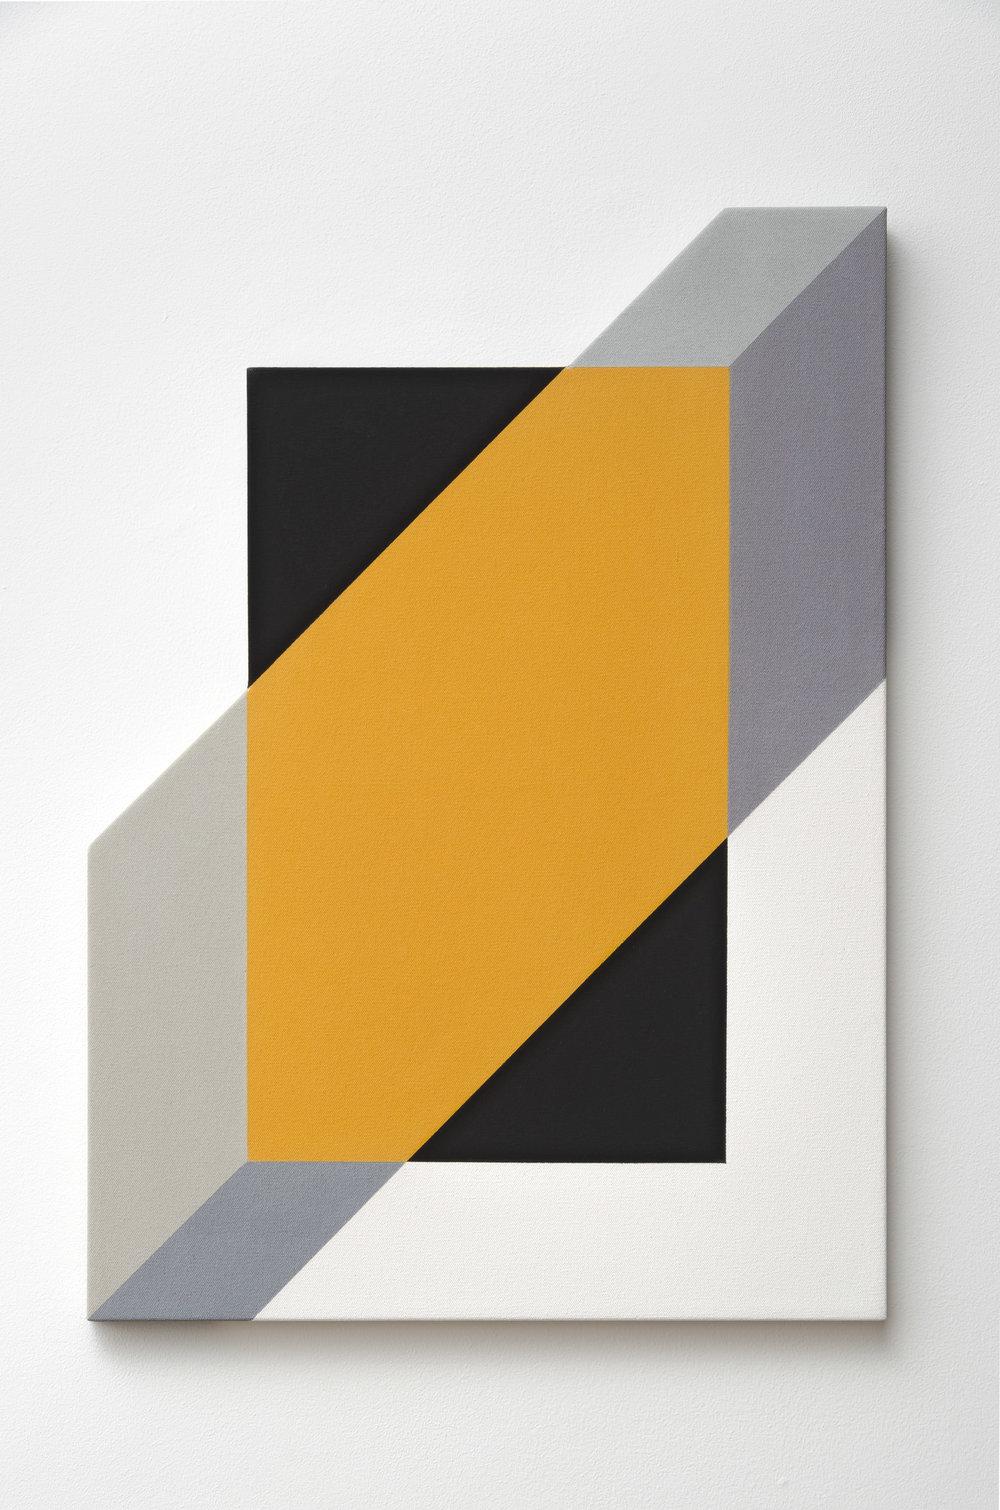 Mokha Laget, b. 1959   Ventana #3 , 2018  acrylic on shaped canvas  28 x 20 inches; 71.1 x 50.8 centimeters